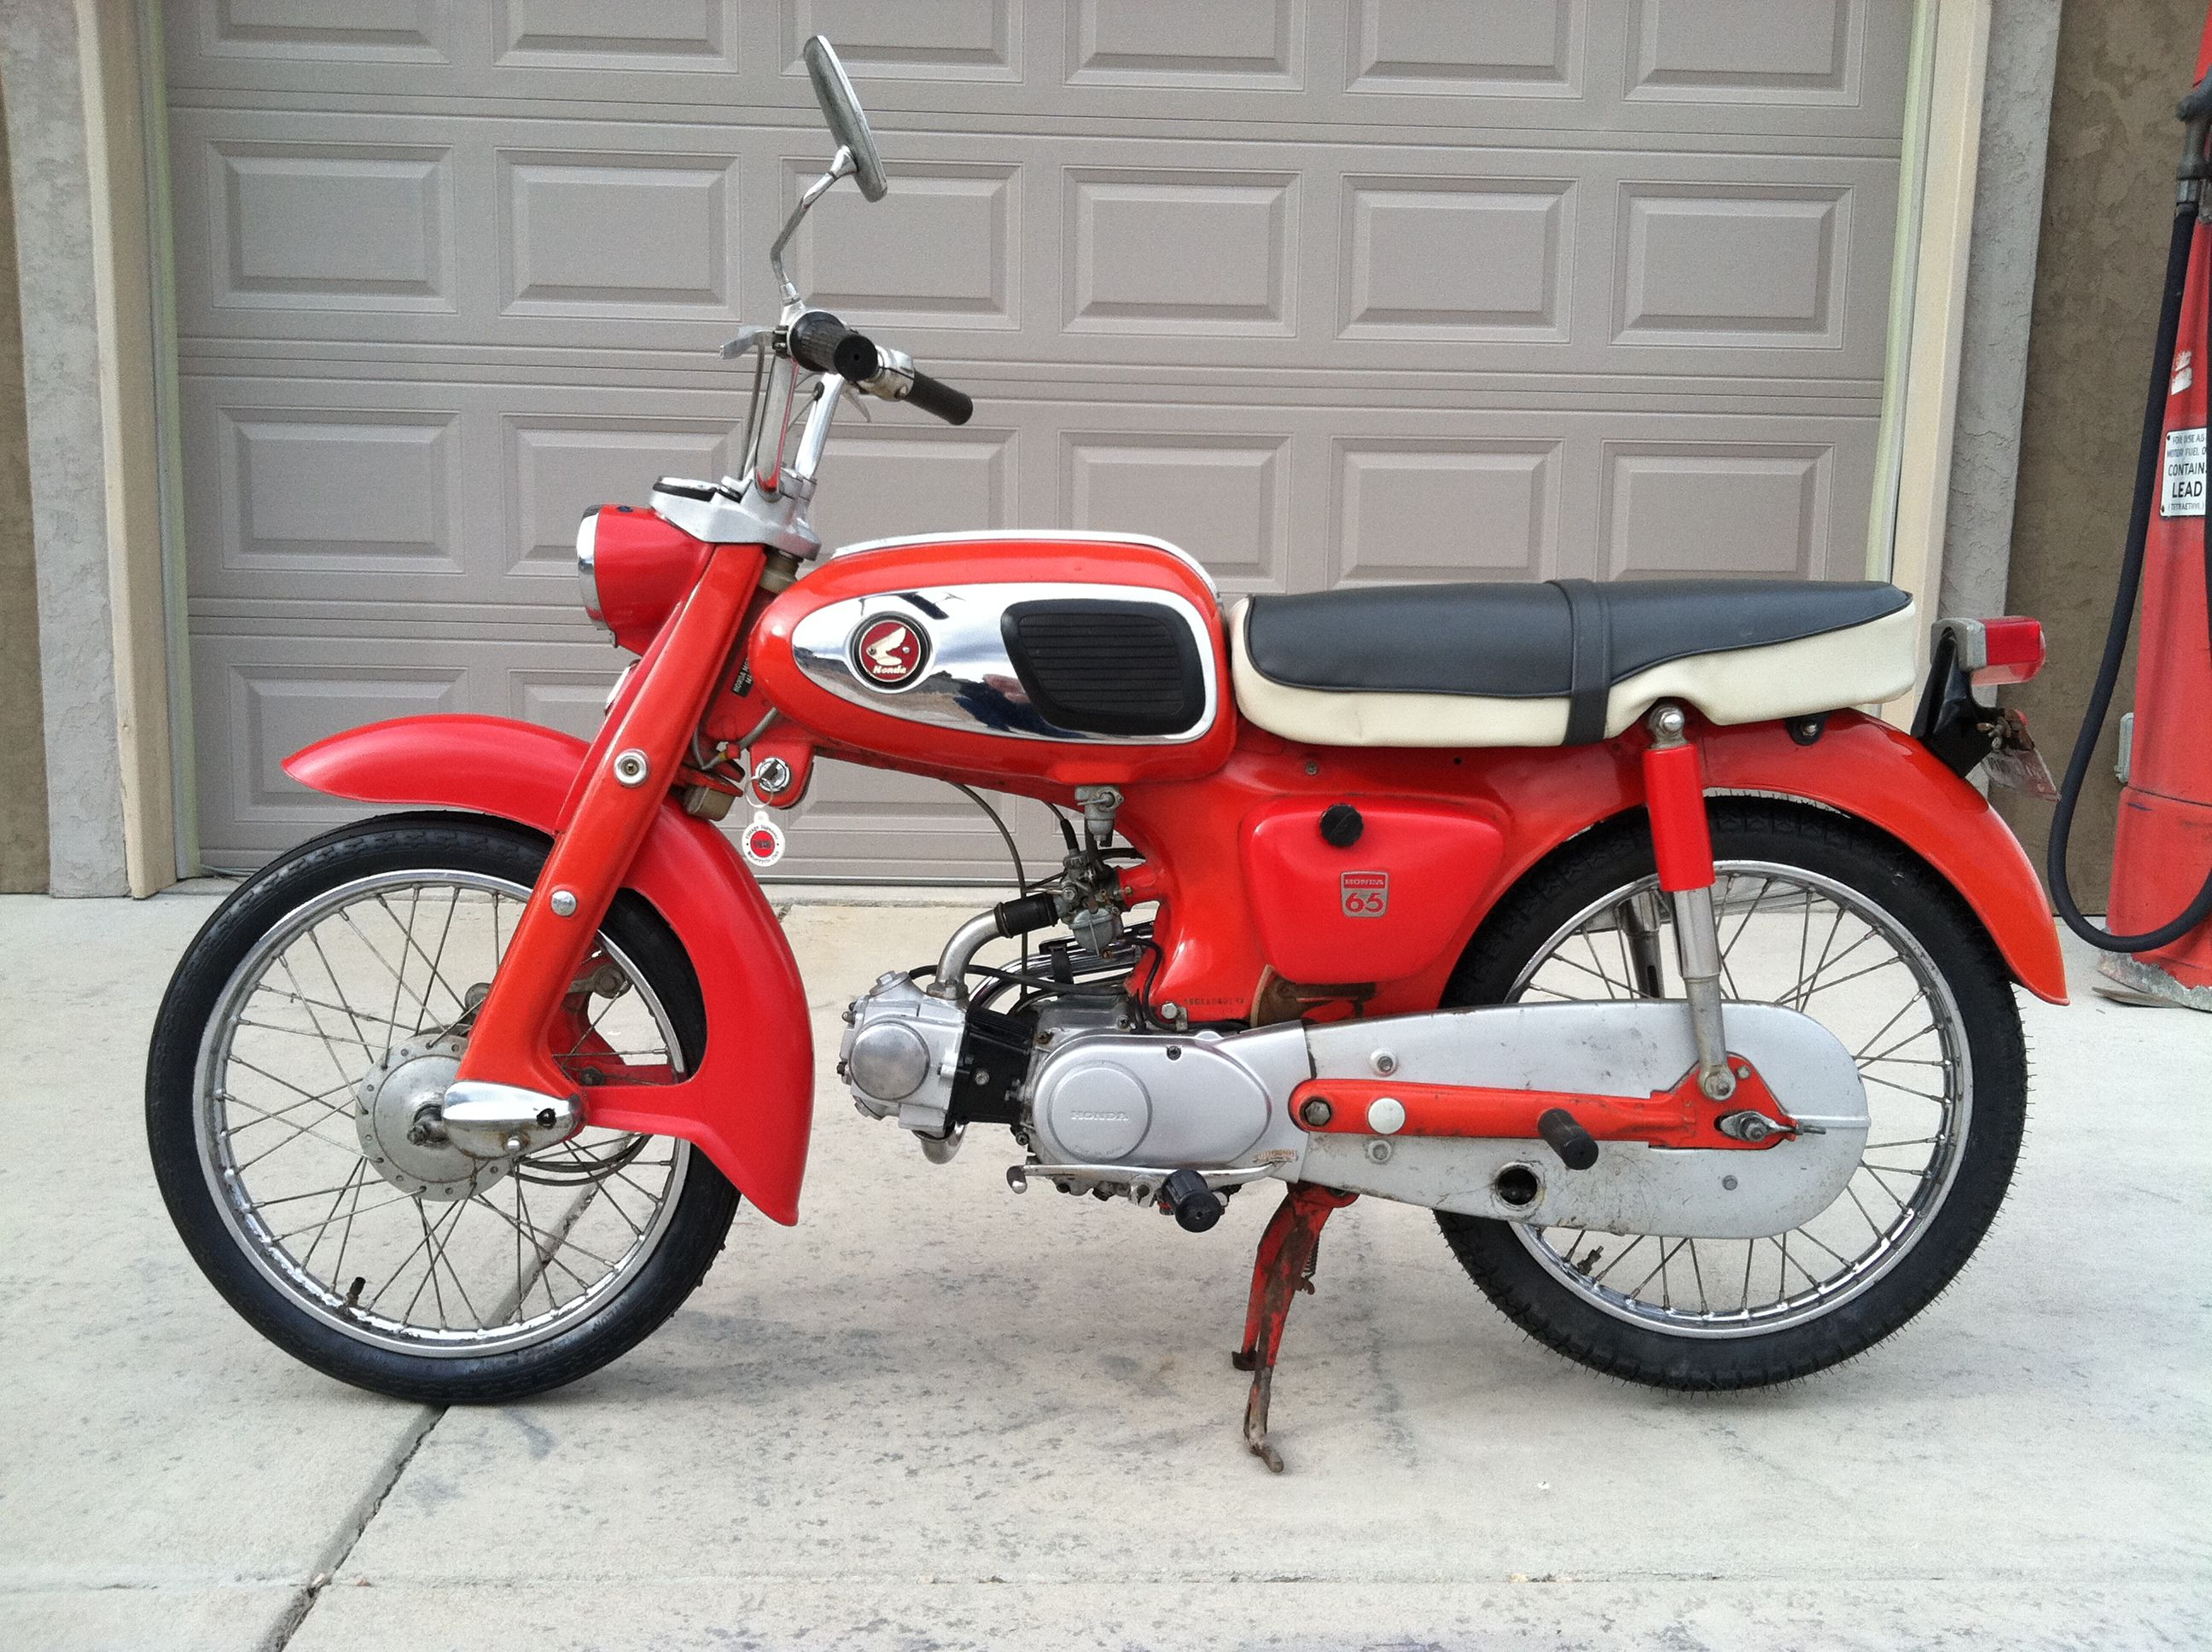 69 best vintage honda motorcycles images on pinterest | vintage